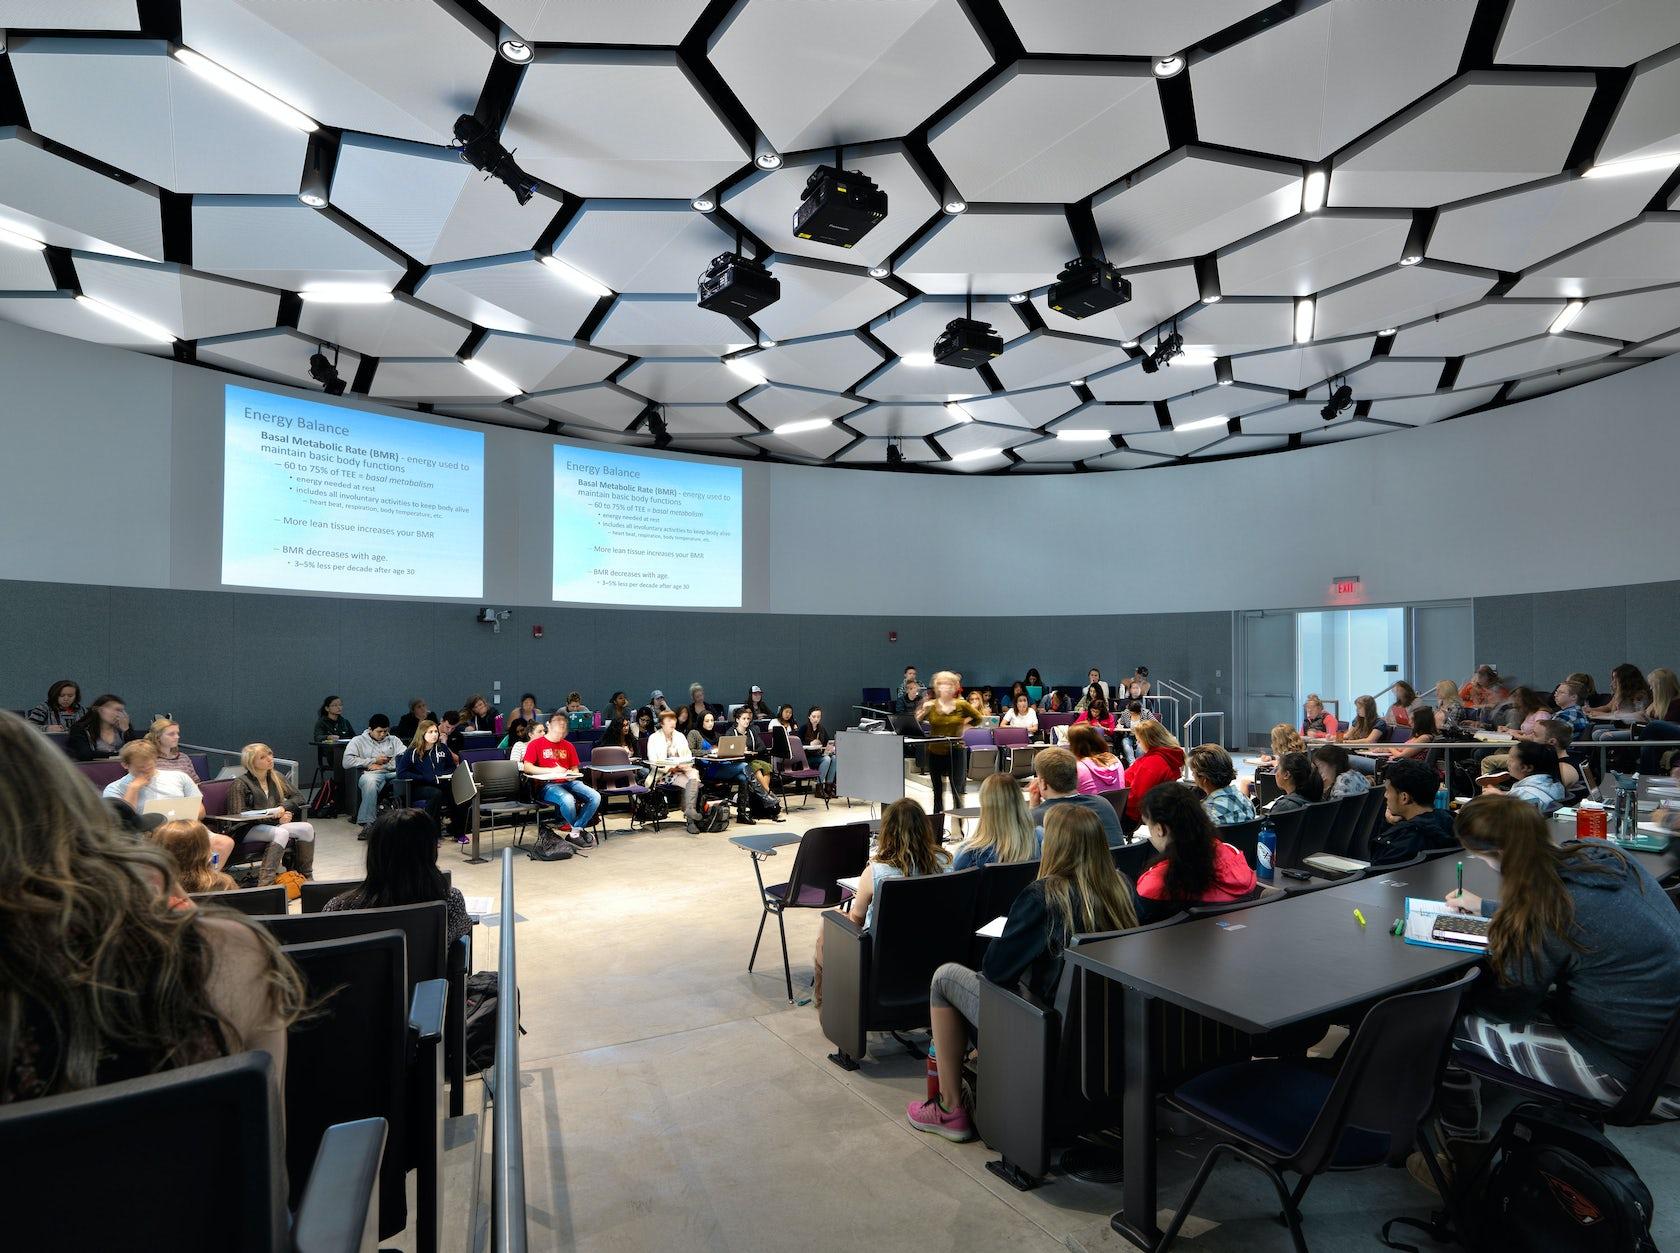 Innovative Classroom Projects : Oregon state university learning innovation center